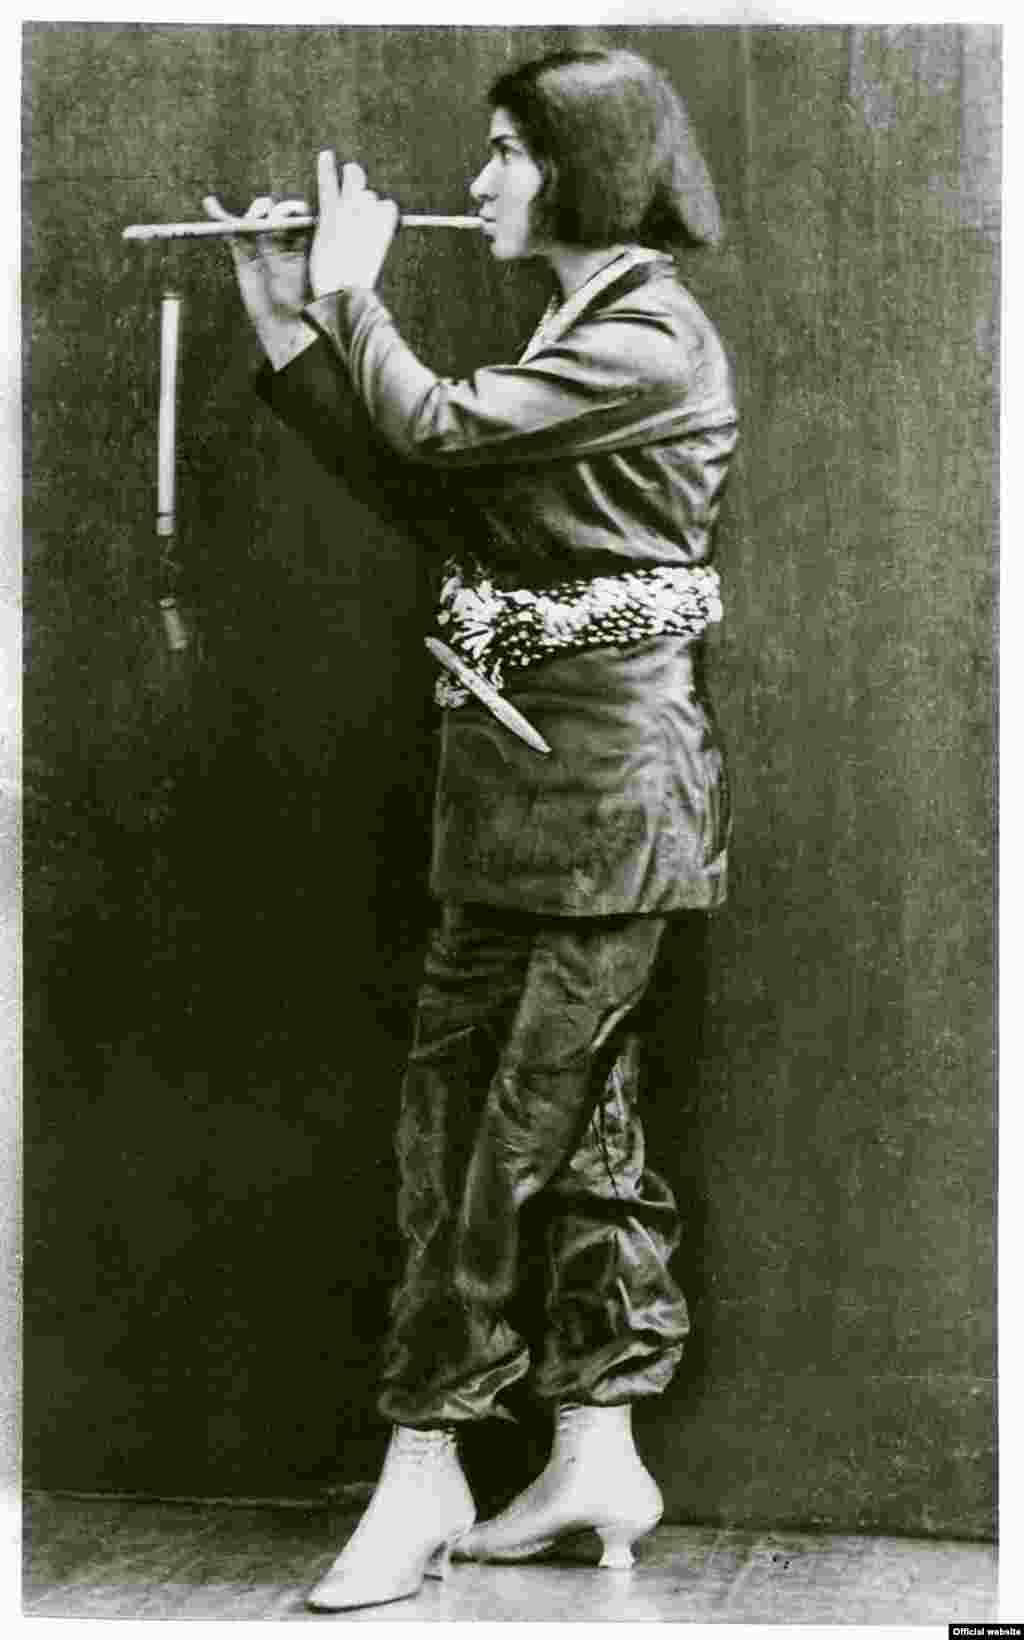 Else Lasker Schüler, Flötenspielende, 1912.